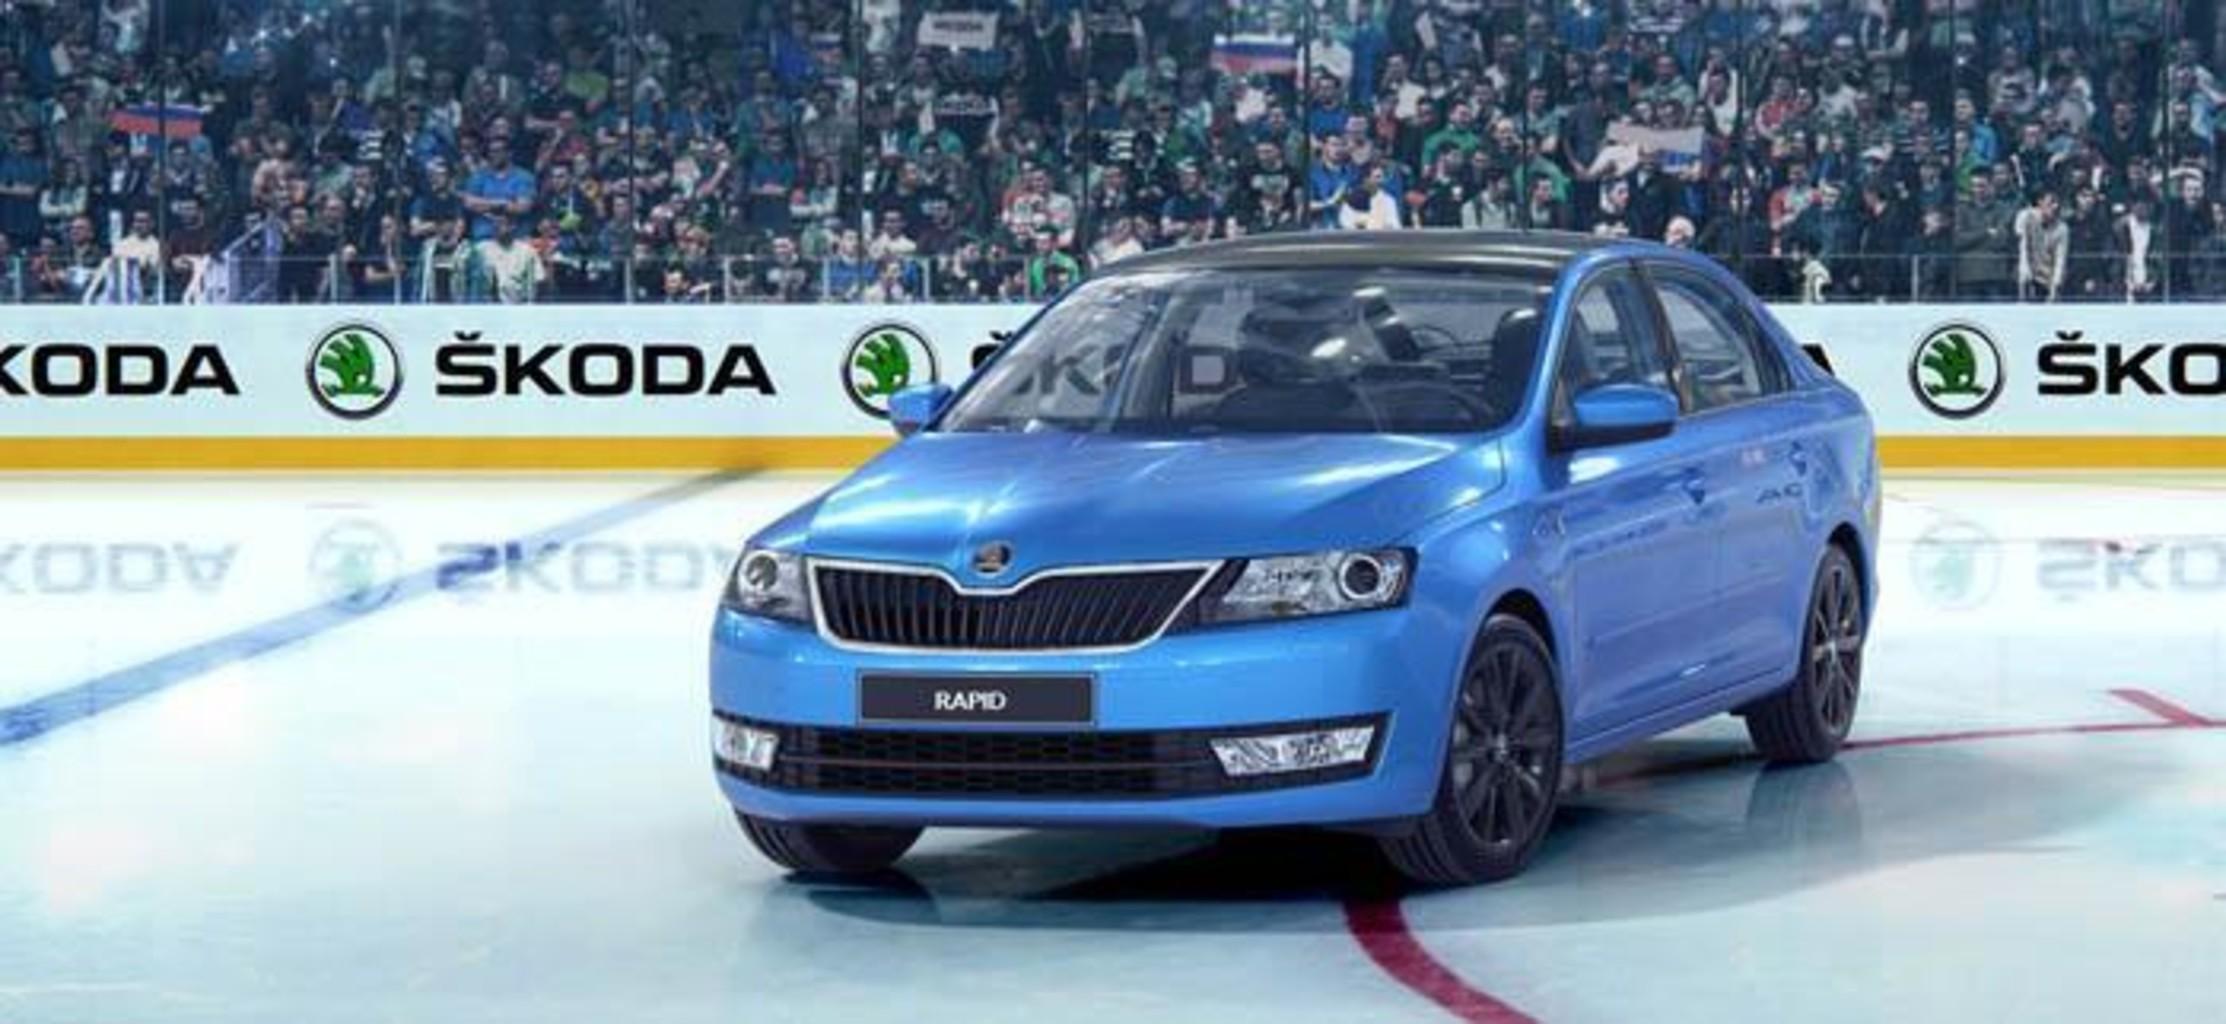 Skoda rapid hockey edition 1